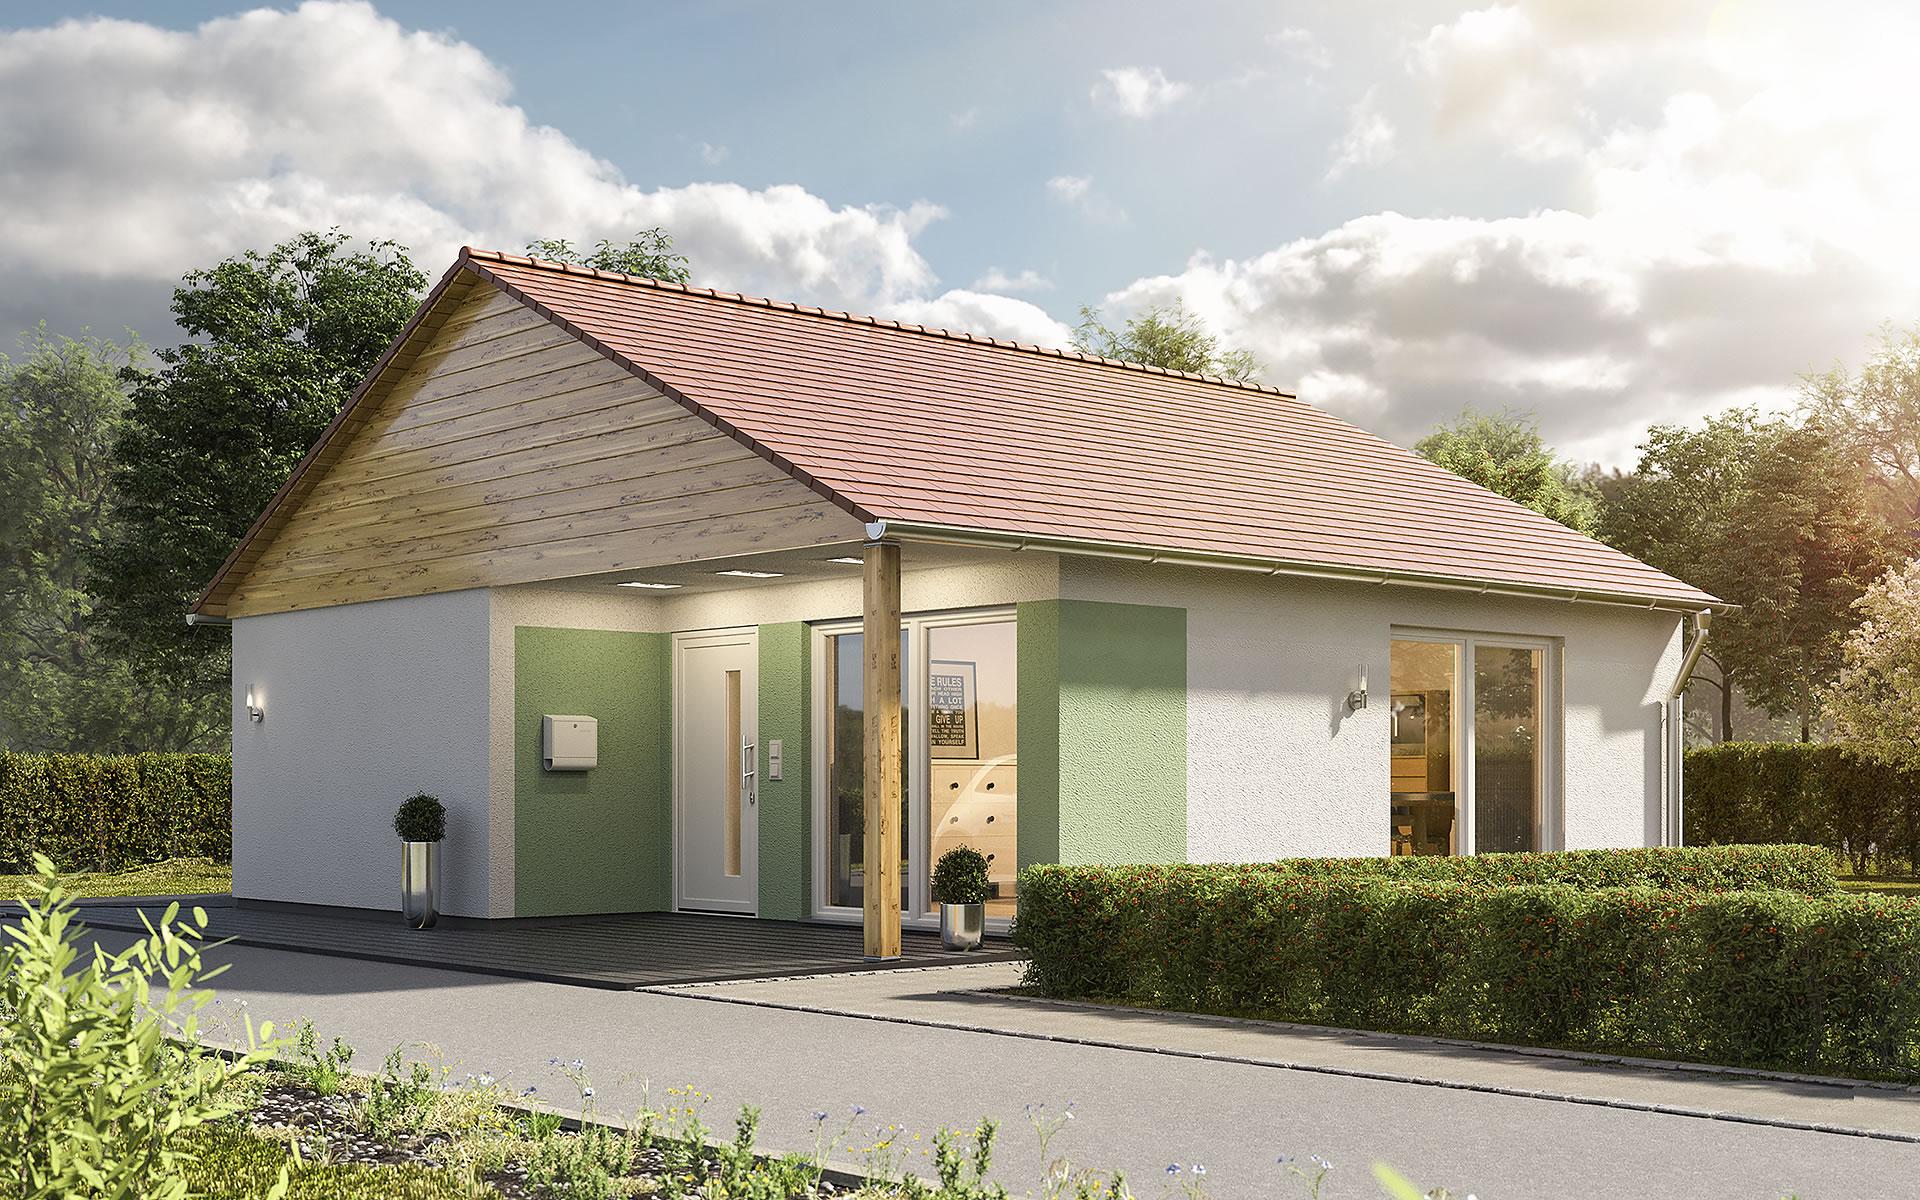 Glückswelthaus 61 - Town & Country Haus Lizenzgeber GmbH